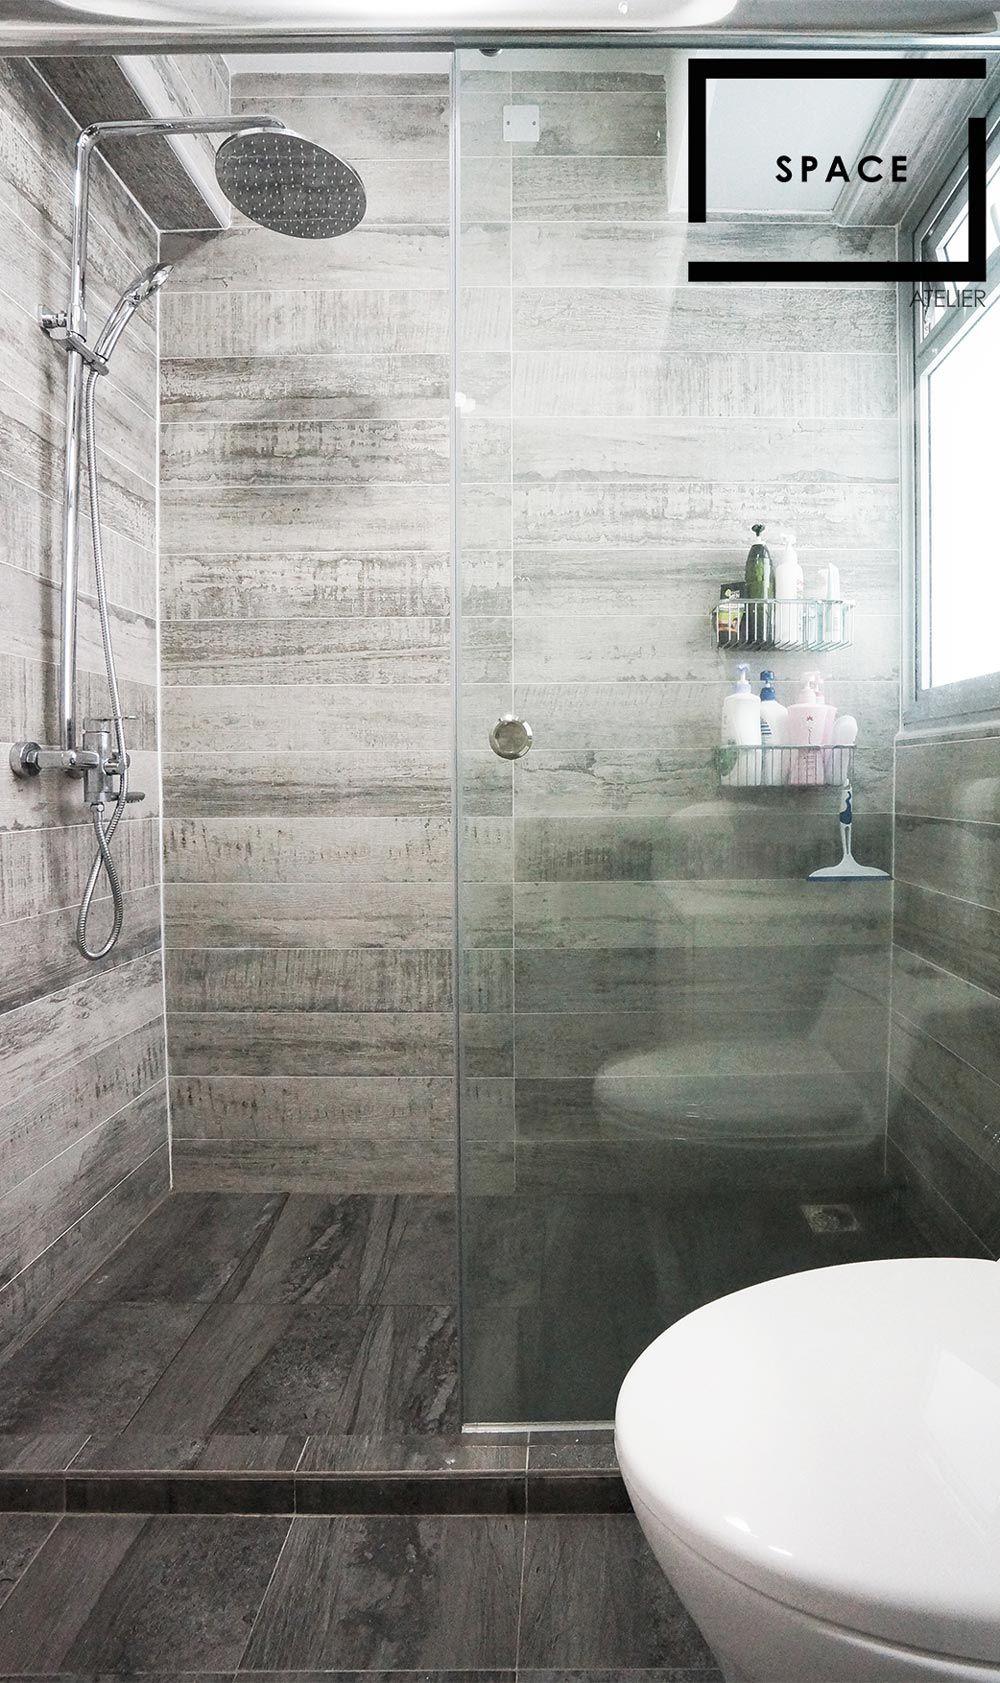 Senja parc view minimalism hdb interior design bathroom for Bathroom interior design bd